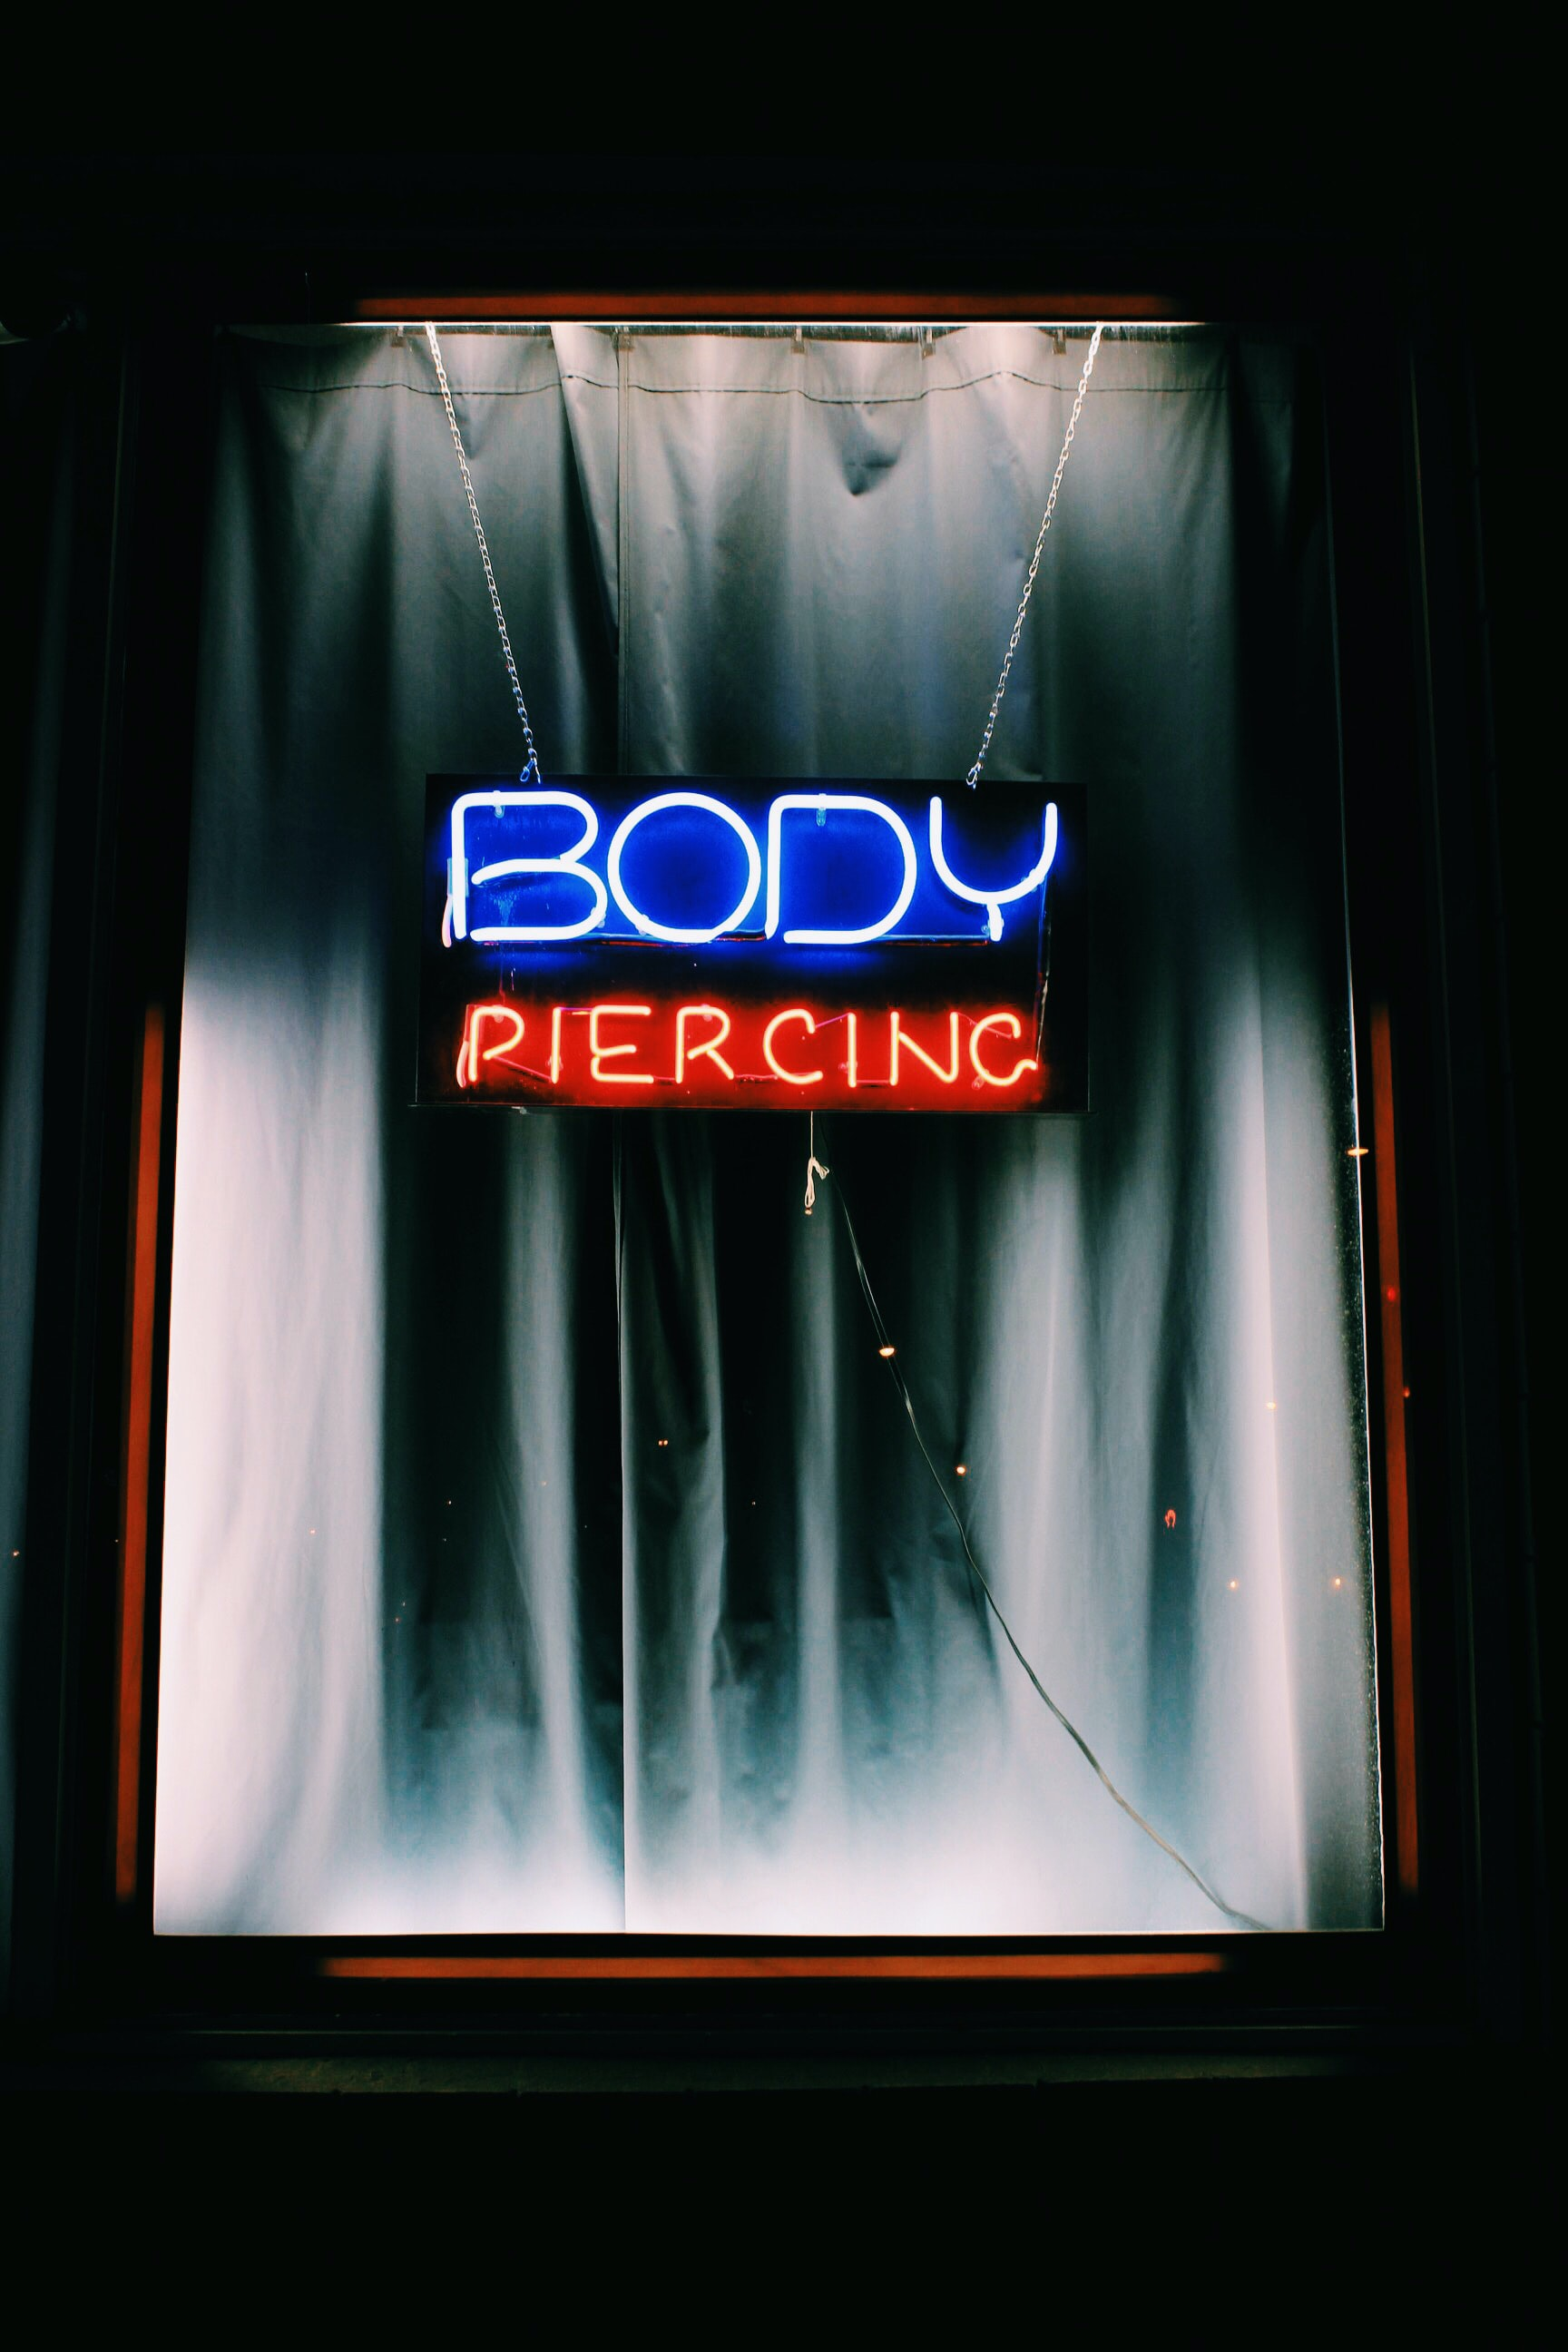 Body Piercing signage